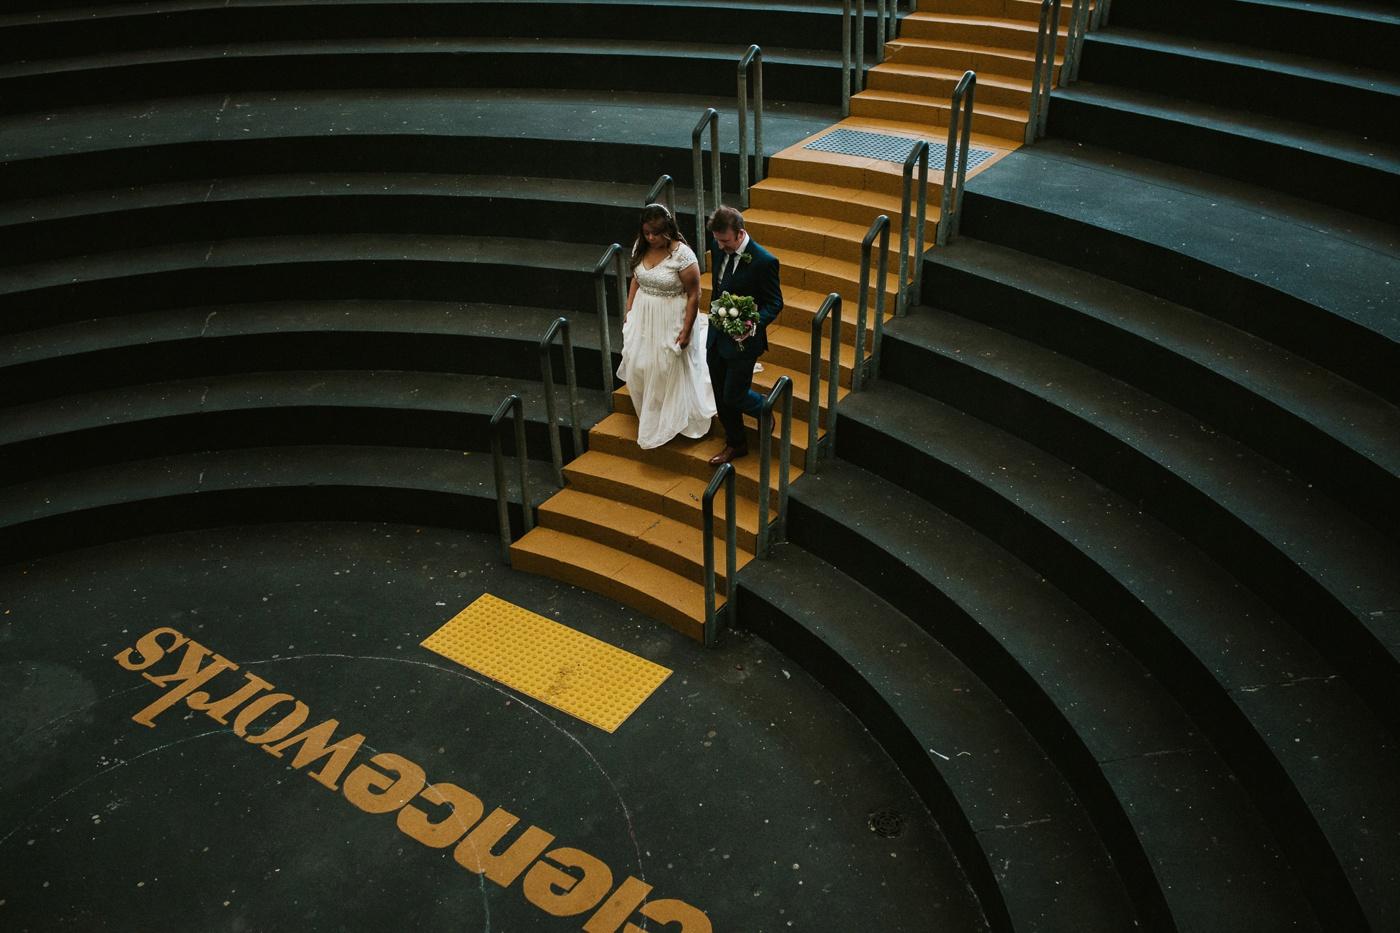 anitadaniel_melbourne-scienceworks-relaxed-fun-geek-wedding_melbourne-candid-wedding-photography_24